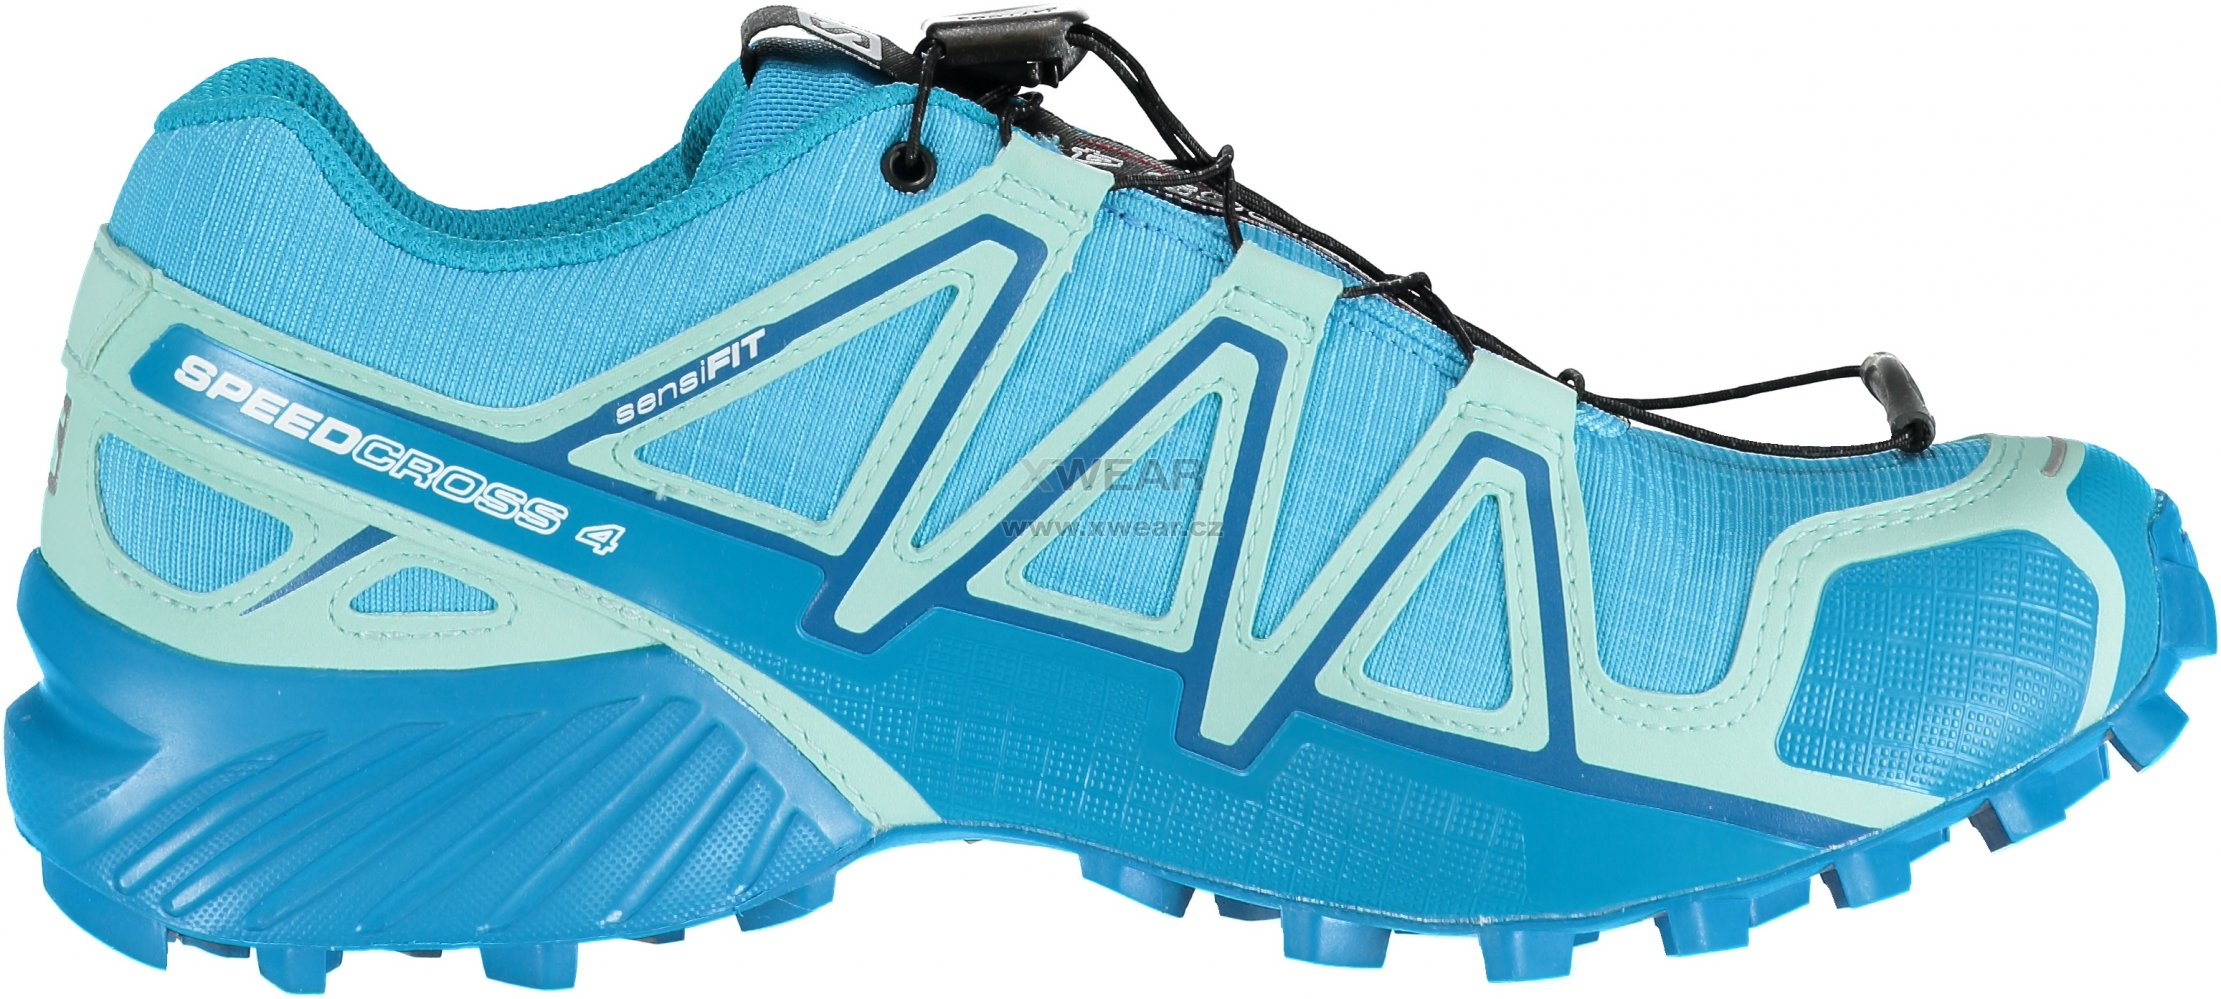 Dámské běžecké boty SALOMON SPEEDCROSS 4 GTX® W L40099900 AQUARIUS BEACH  GLASS HAWAIIAN f04d48d49e